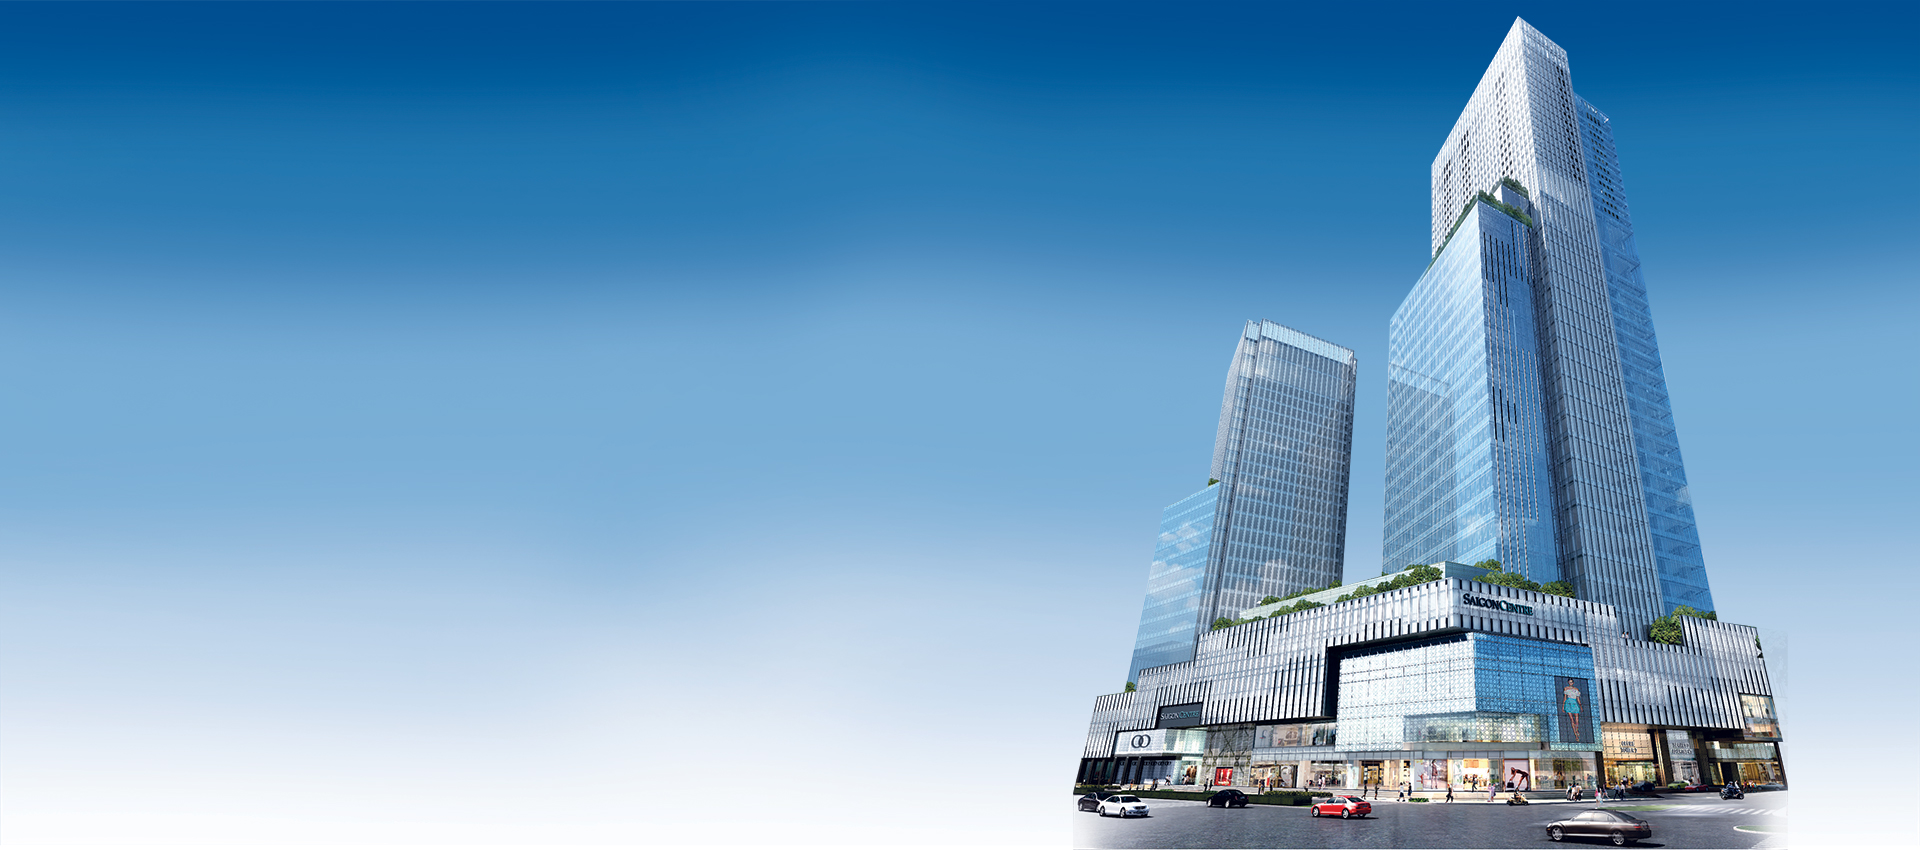 cho-thue-van-phong-hang-a-saigon-centre-2-14-toan-canh-toa-nha-dia-oc-kim-quang